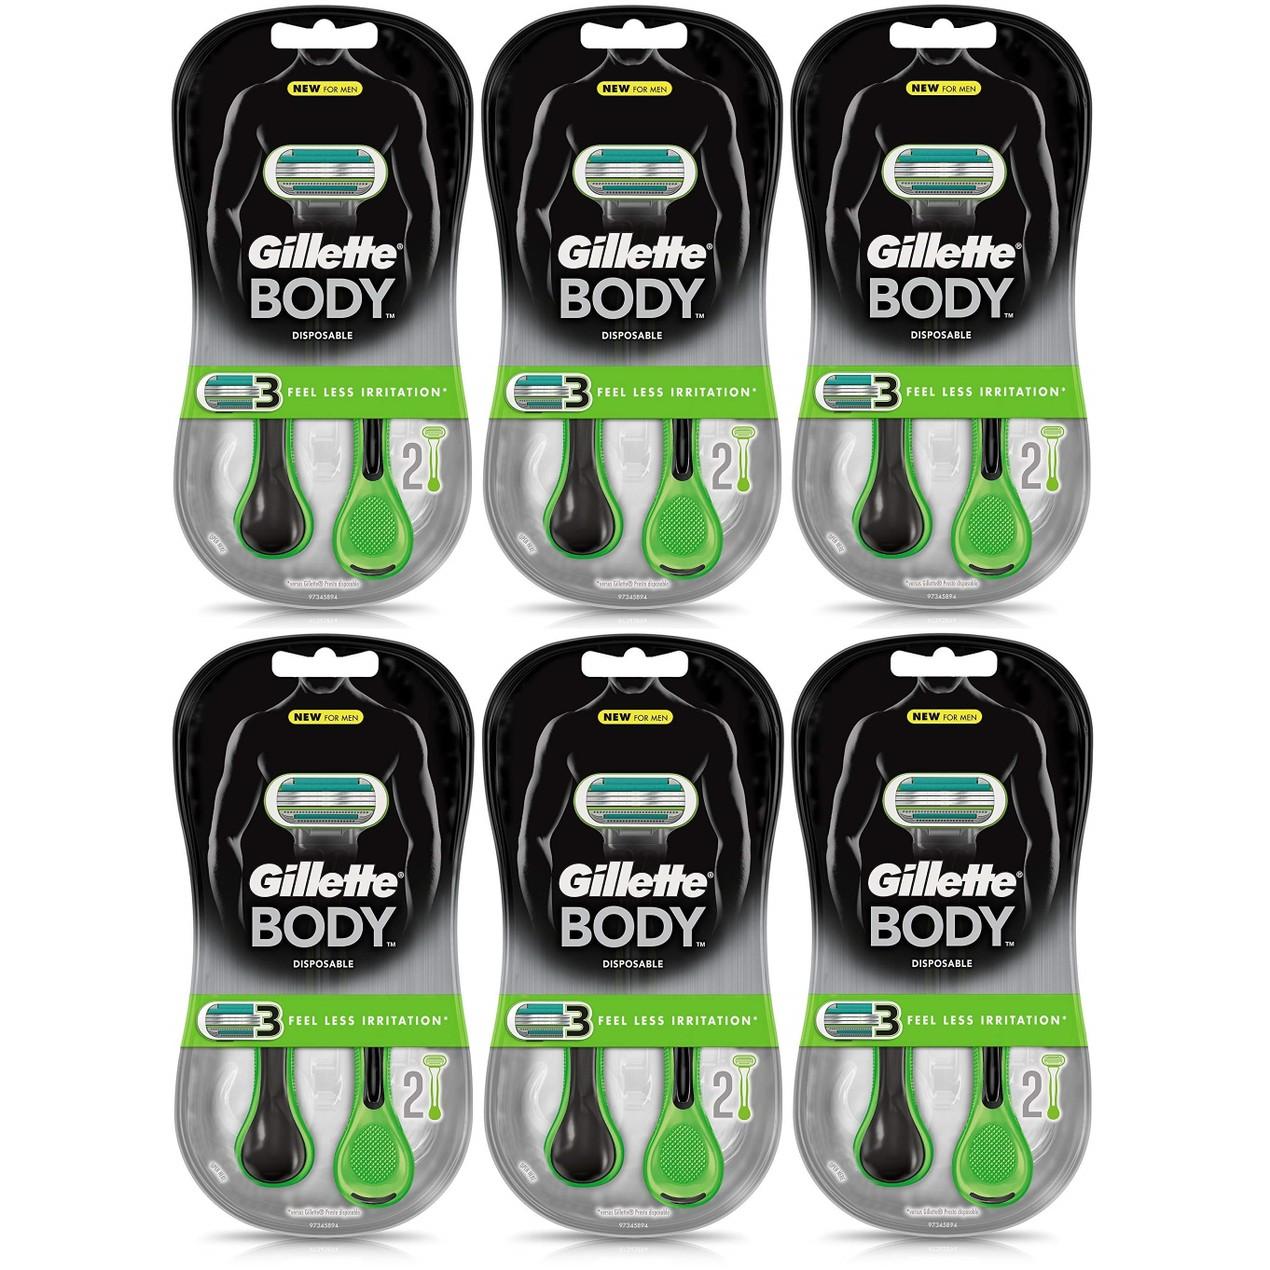 12-Count Gillette Body Disposable Razors